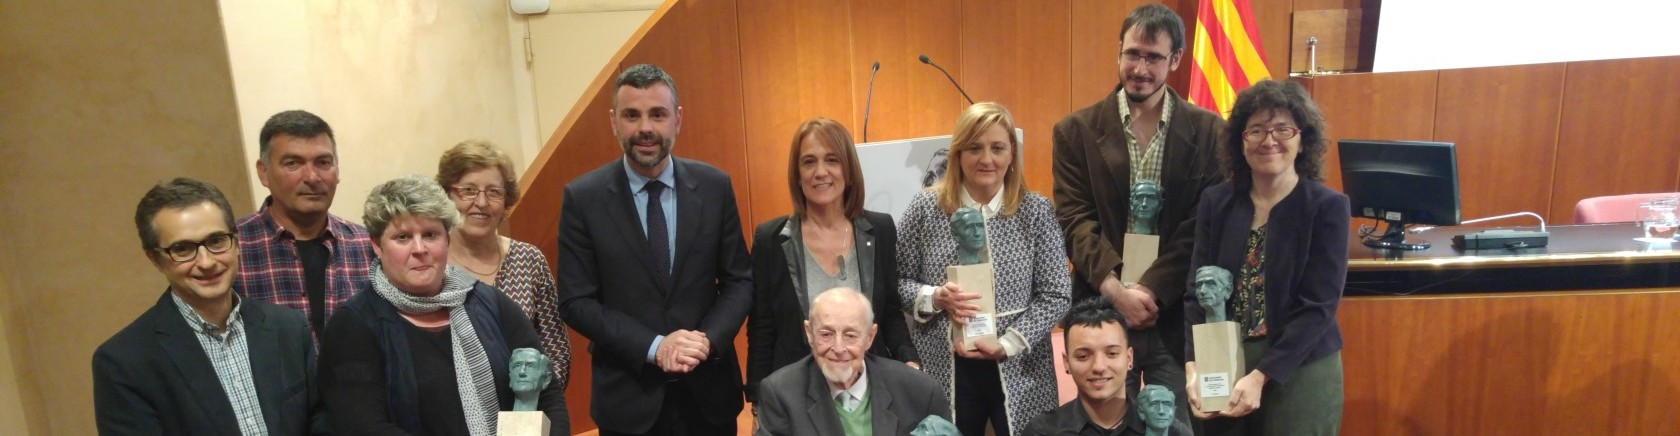 Premi Pompeu Fabra 2016